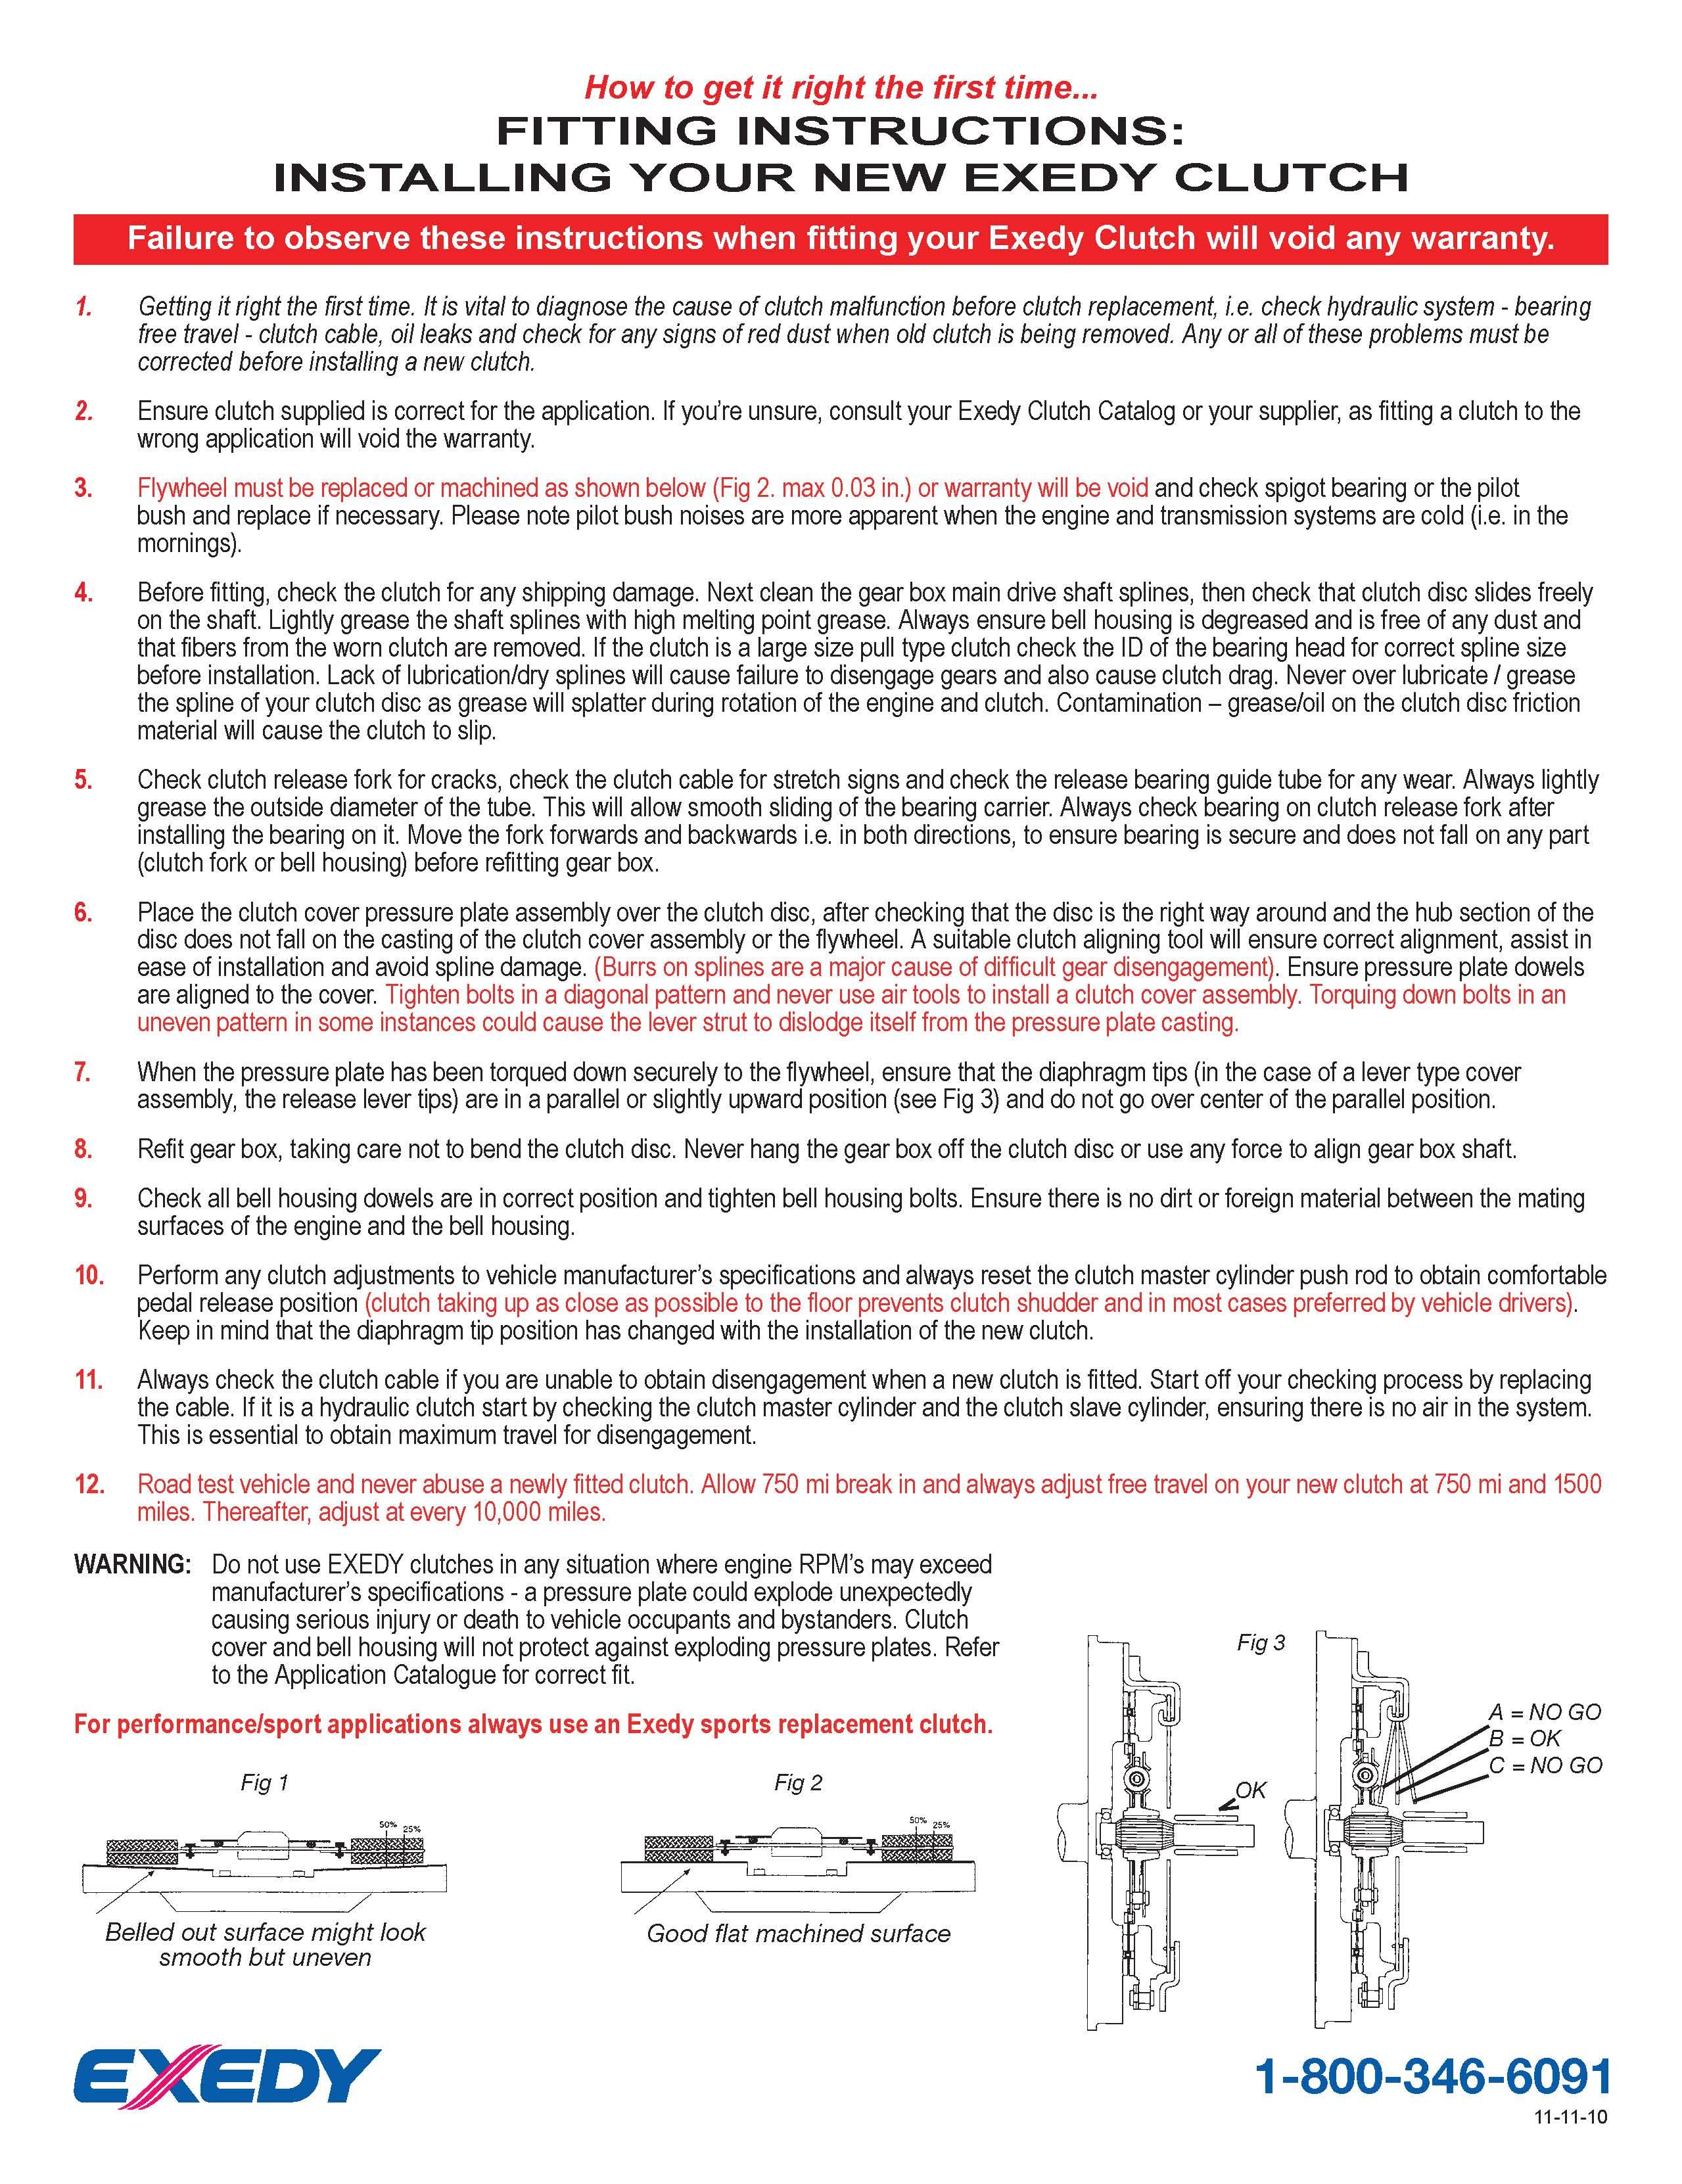 exedy-mach-400-stage-2-clutch-86-mid-01-gt-93-98-cobra